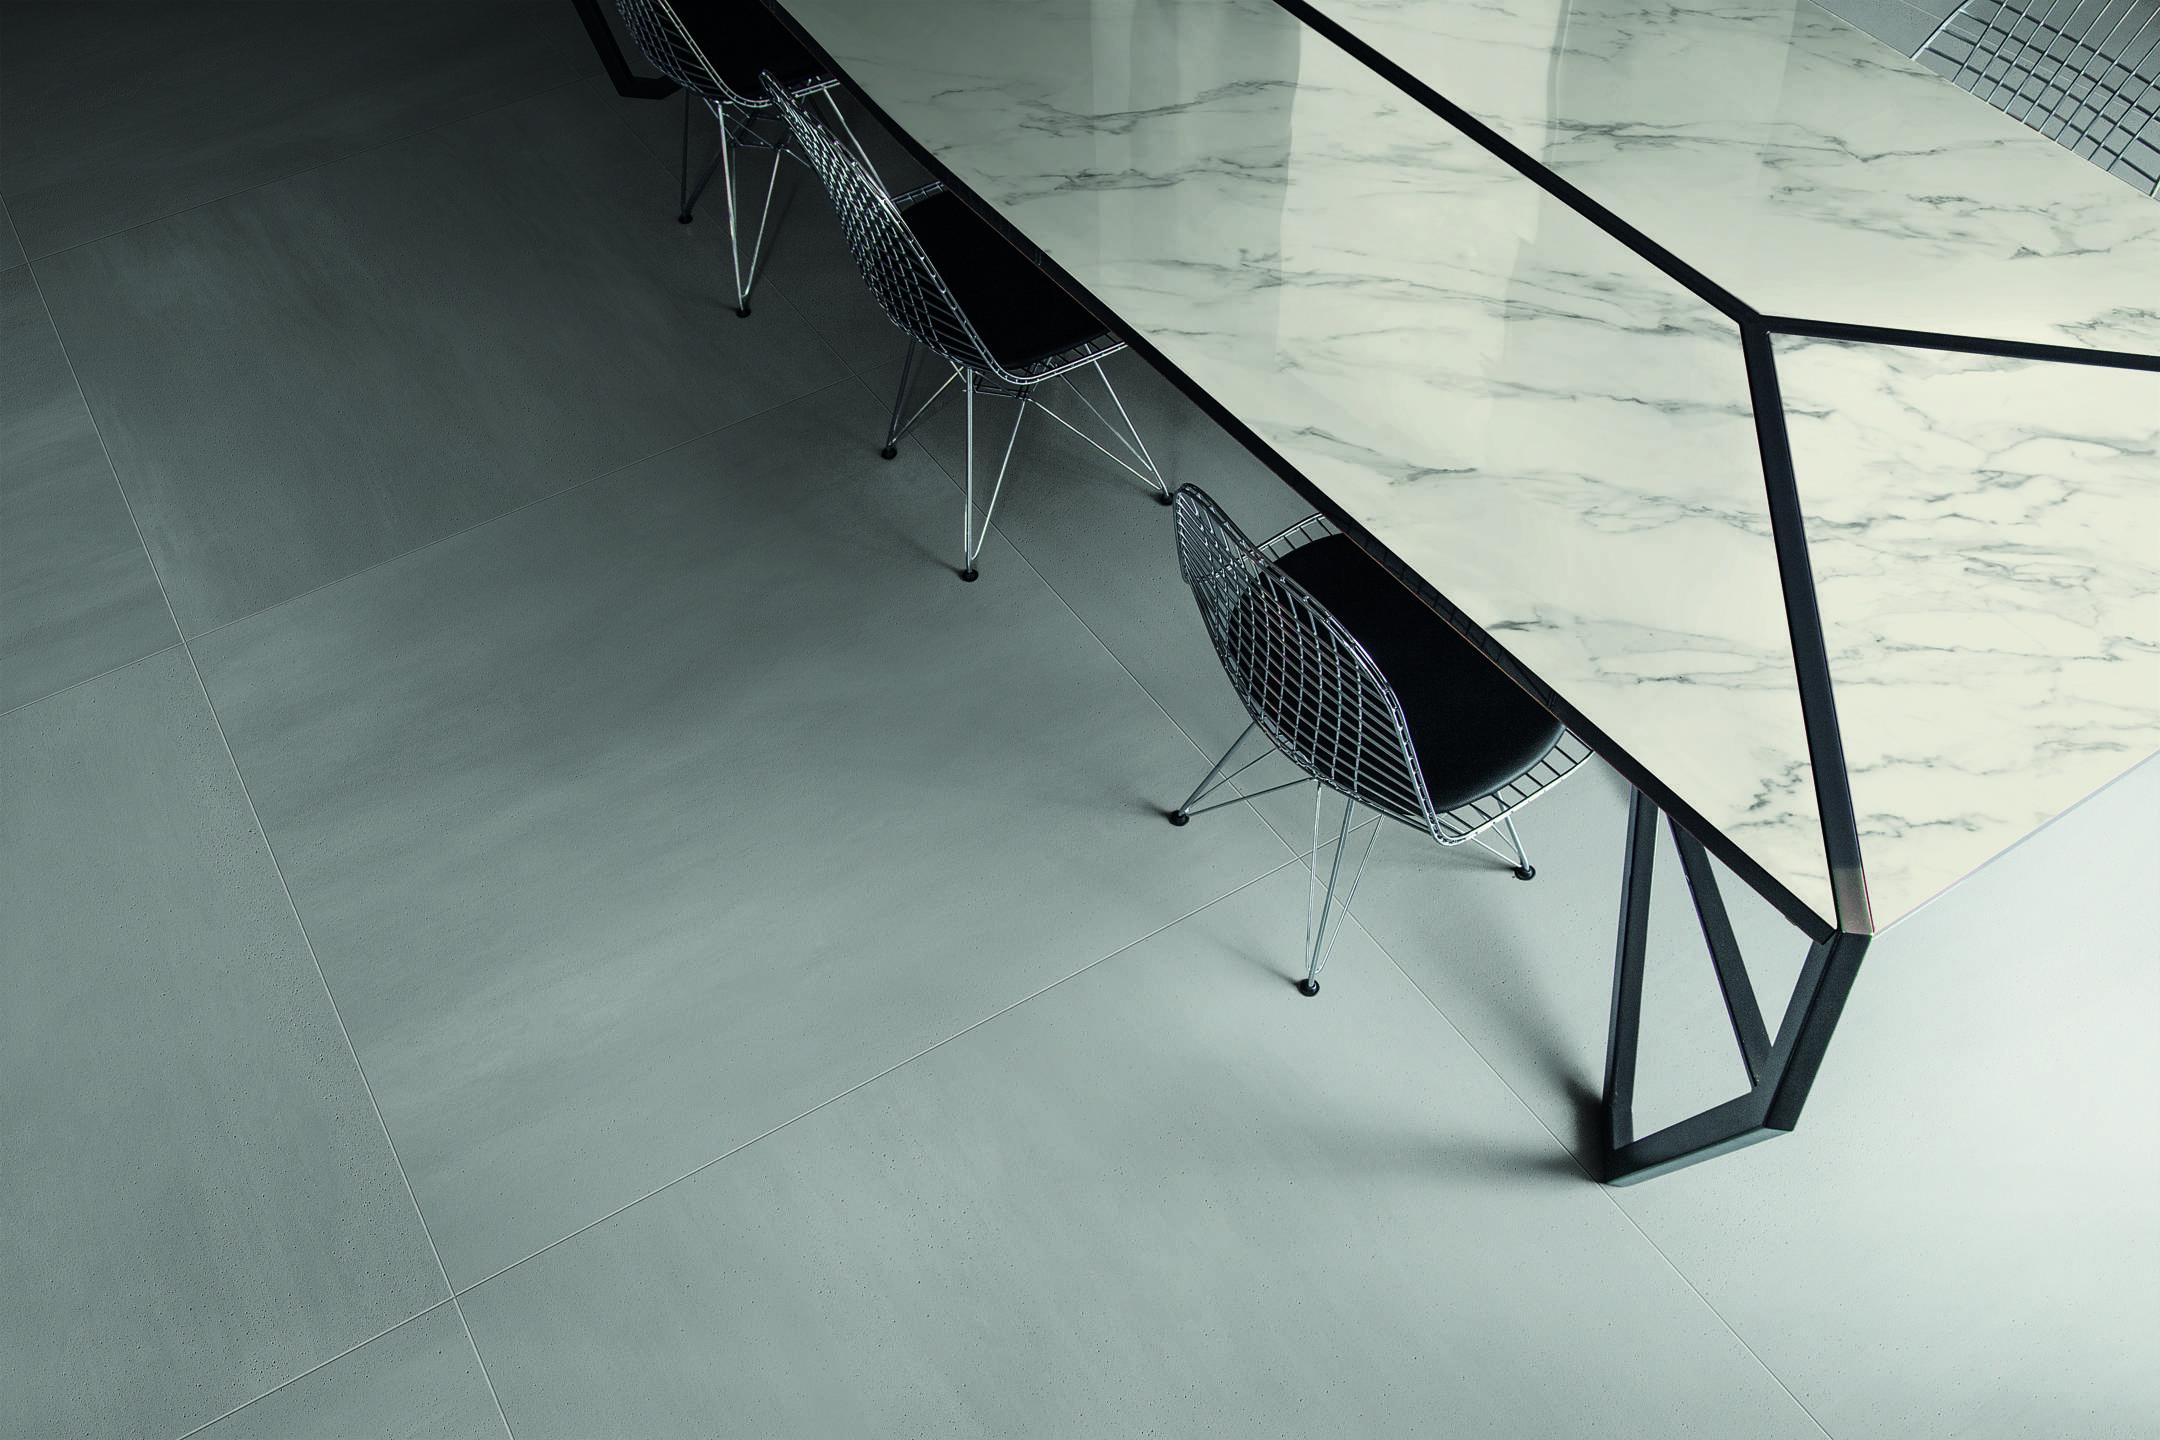 Concrete_Tiles_Sidelwalk_120x120